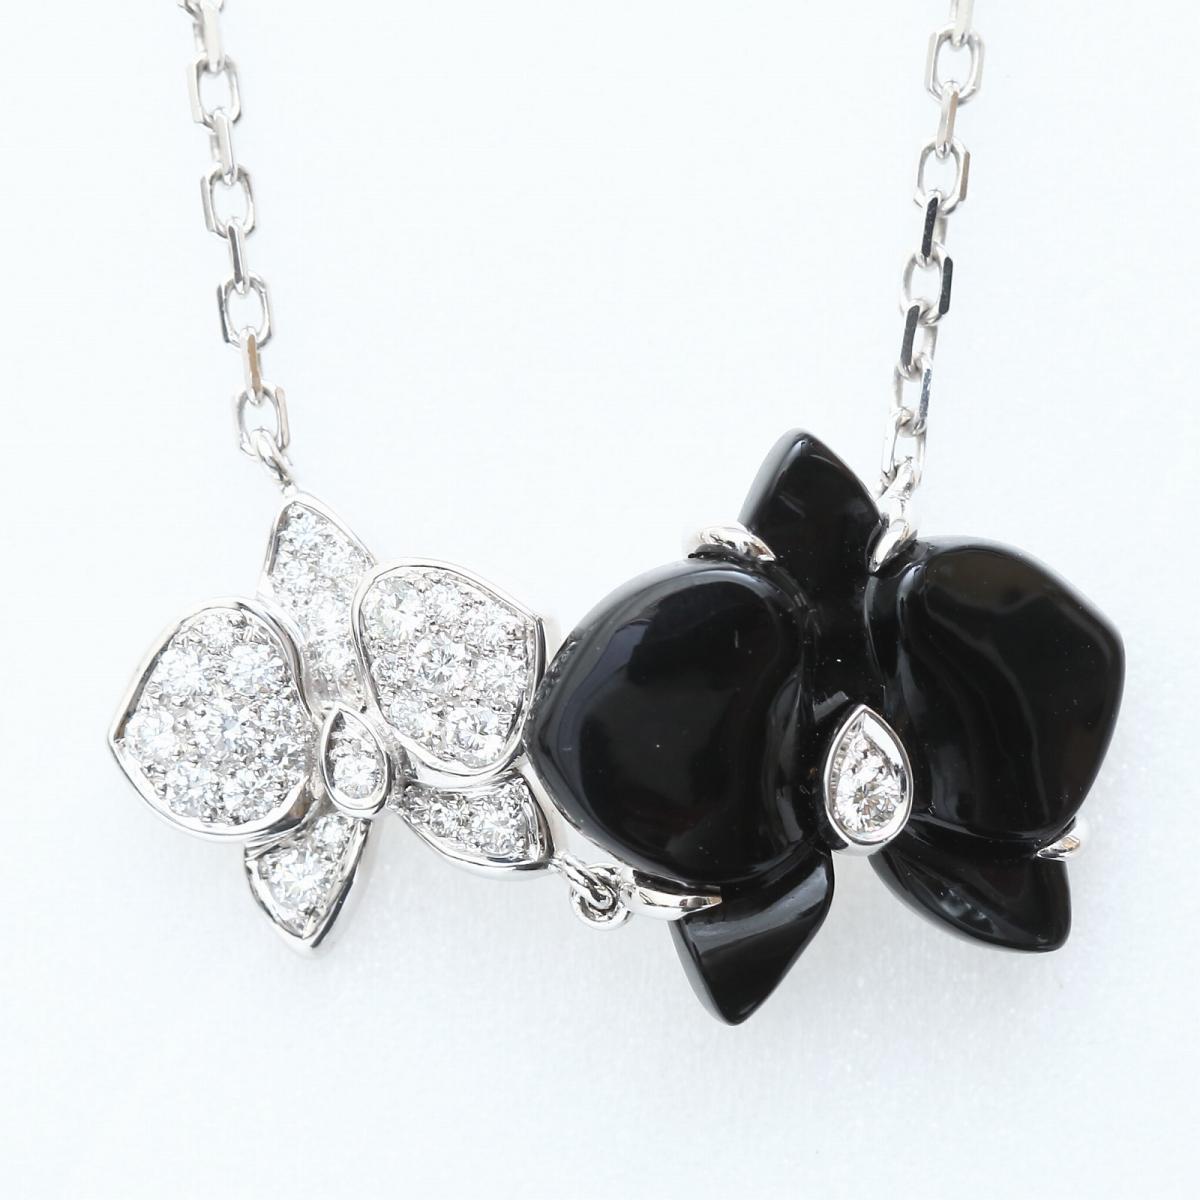 Cartier 貴金属・宝石  カレスドルキデパルネックレス ダイヤモンド ブラックセラミック